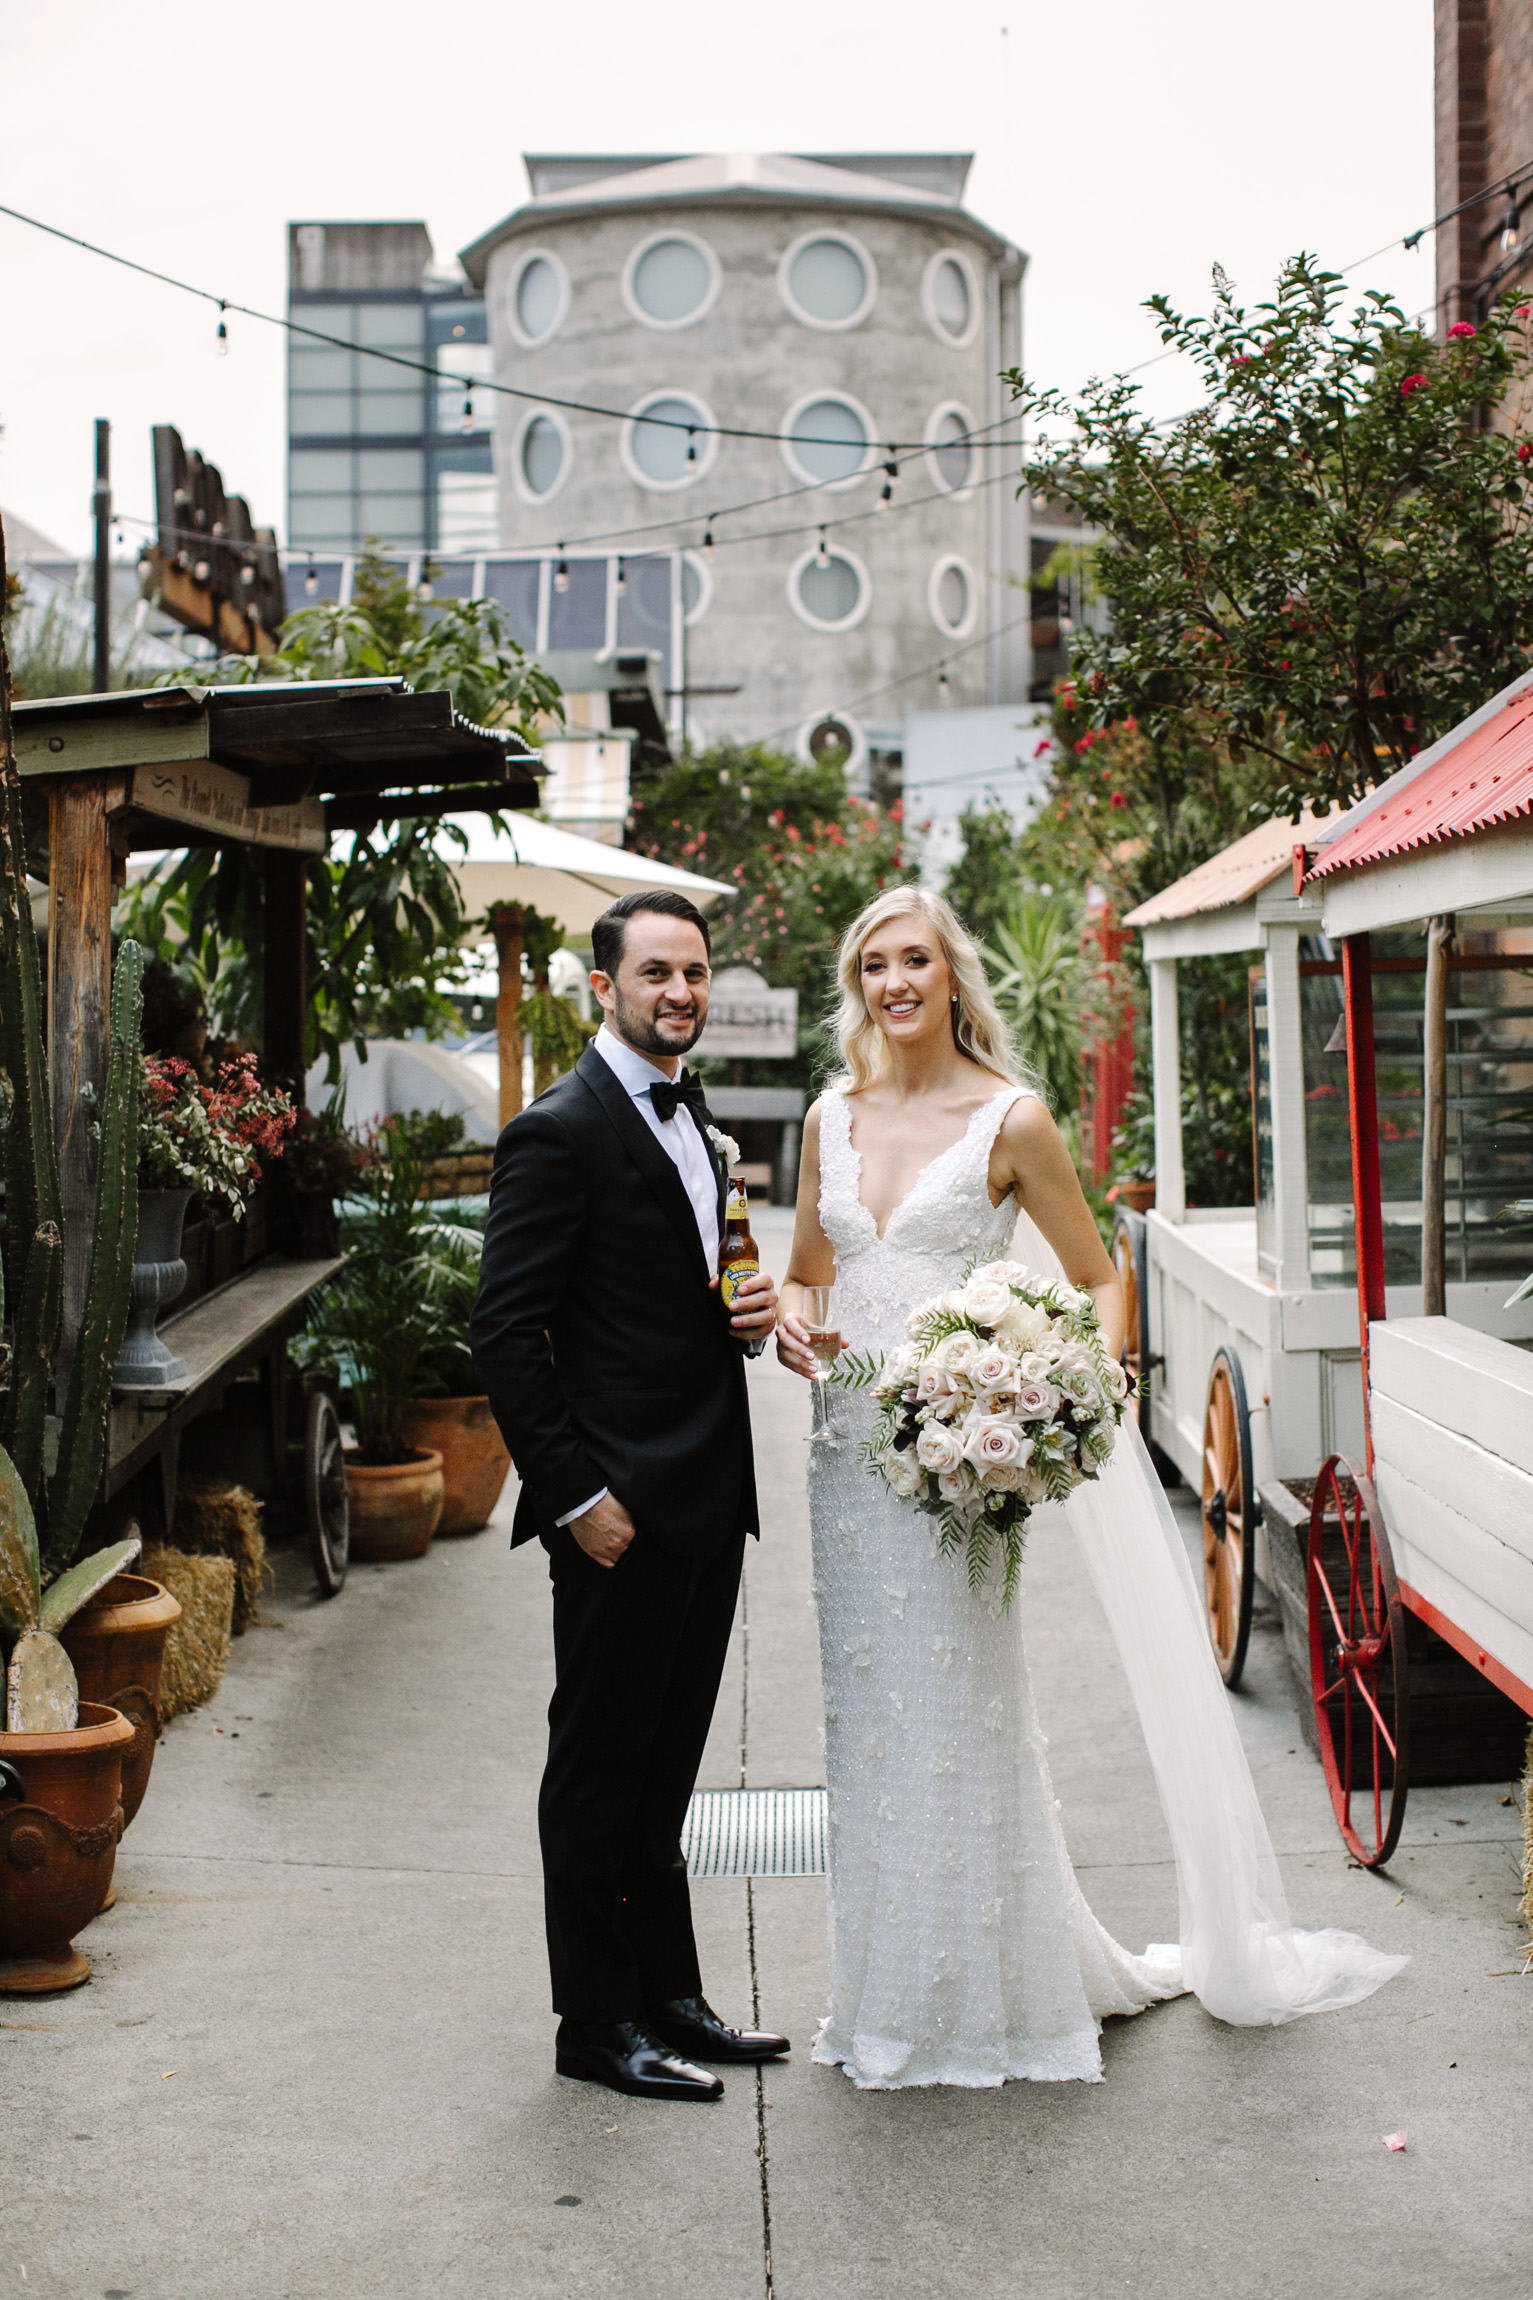 180223_justinaaron_wedding_charlotte_david_h-154.jpg